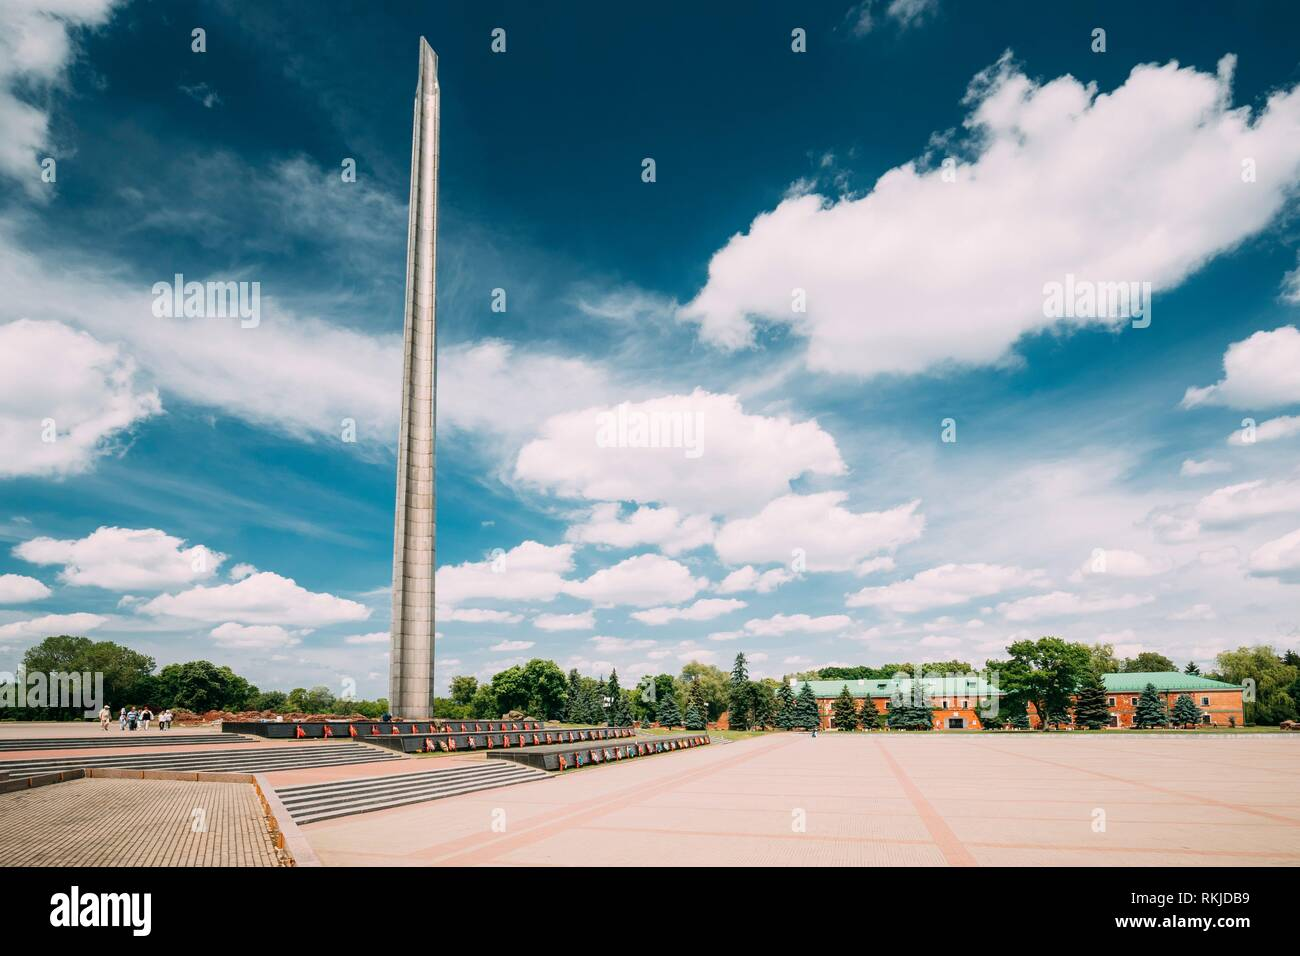 Brest, Belarus. Memorial Monument Bayonet - Obelisk In Brest Hero Fortress In Sunny Summer Day. - Stock Image